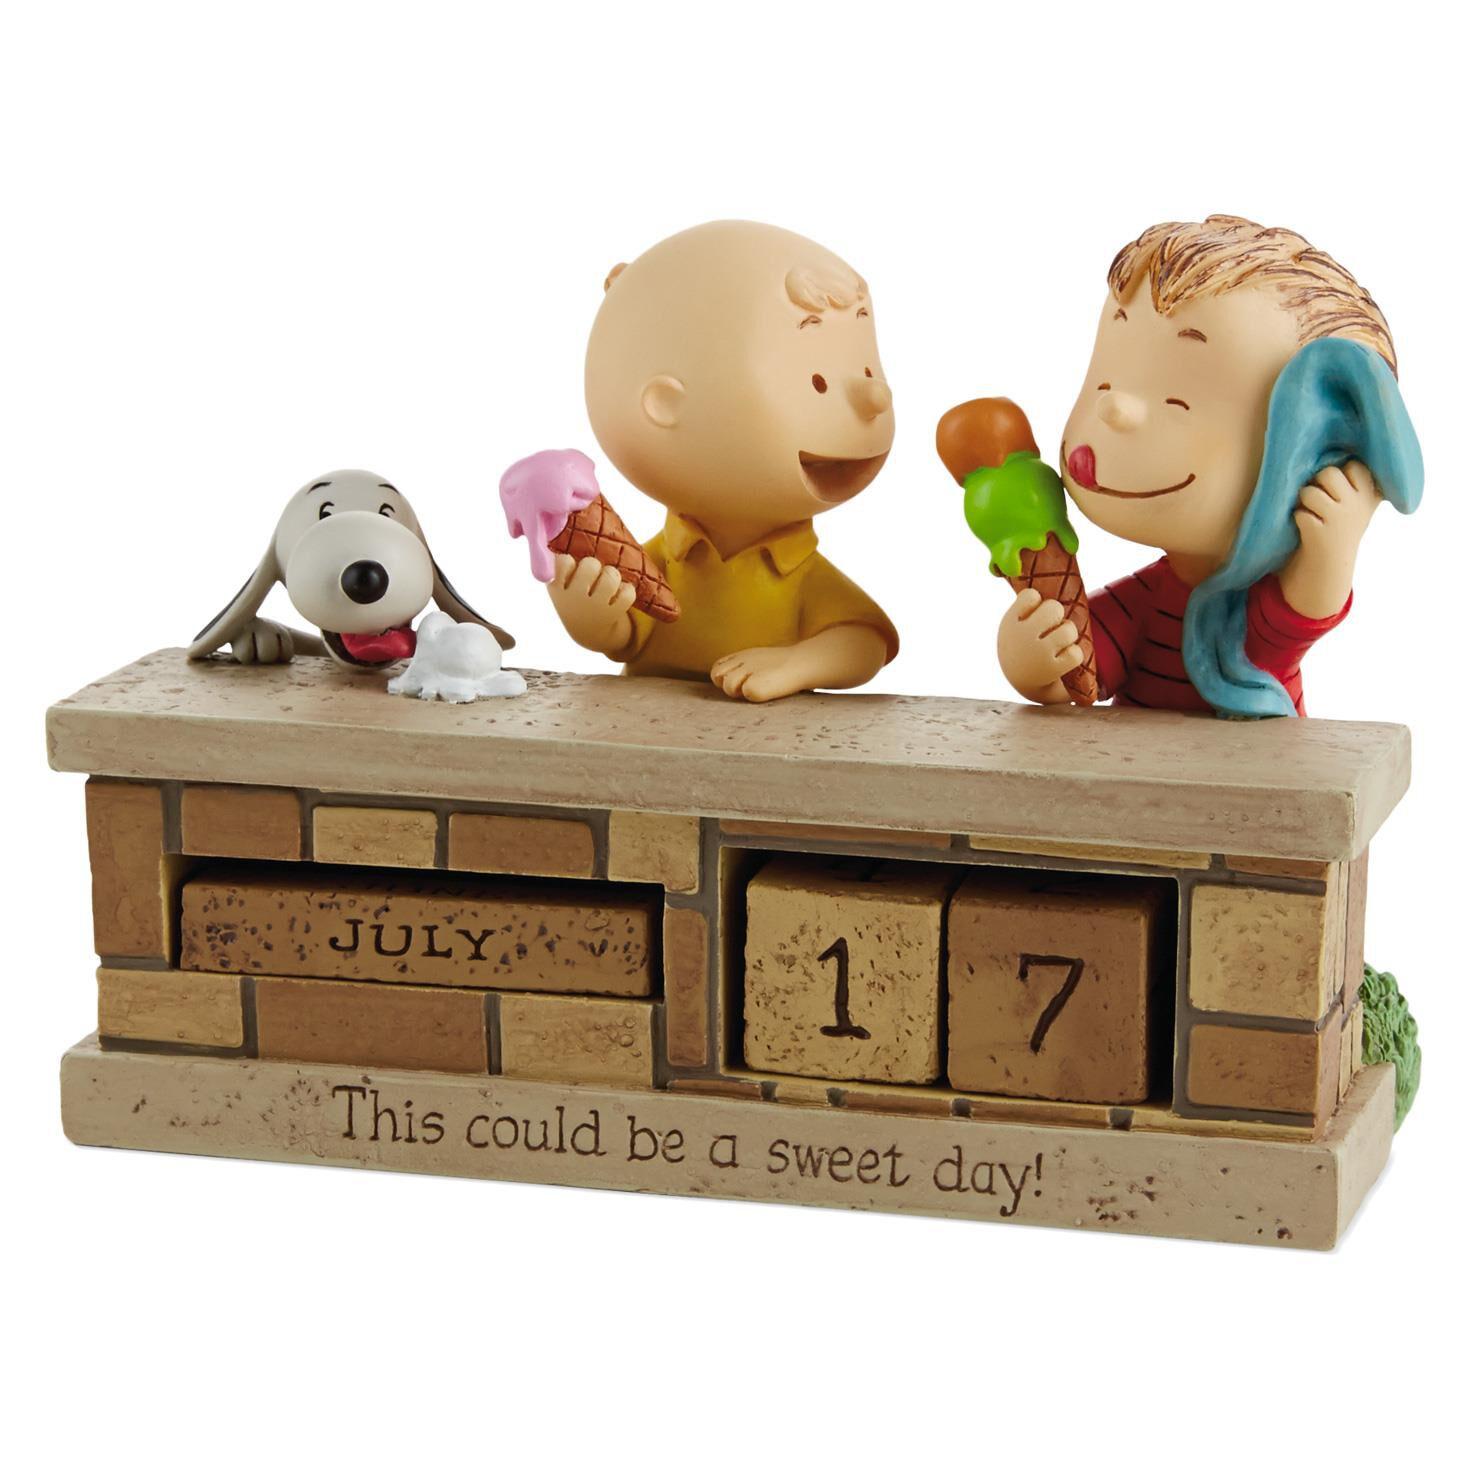 Peanuts® Sweet Day Perpetual Calendar - Calendars - Hallmark